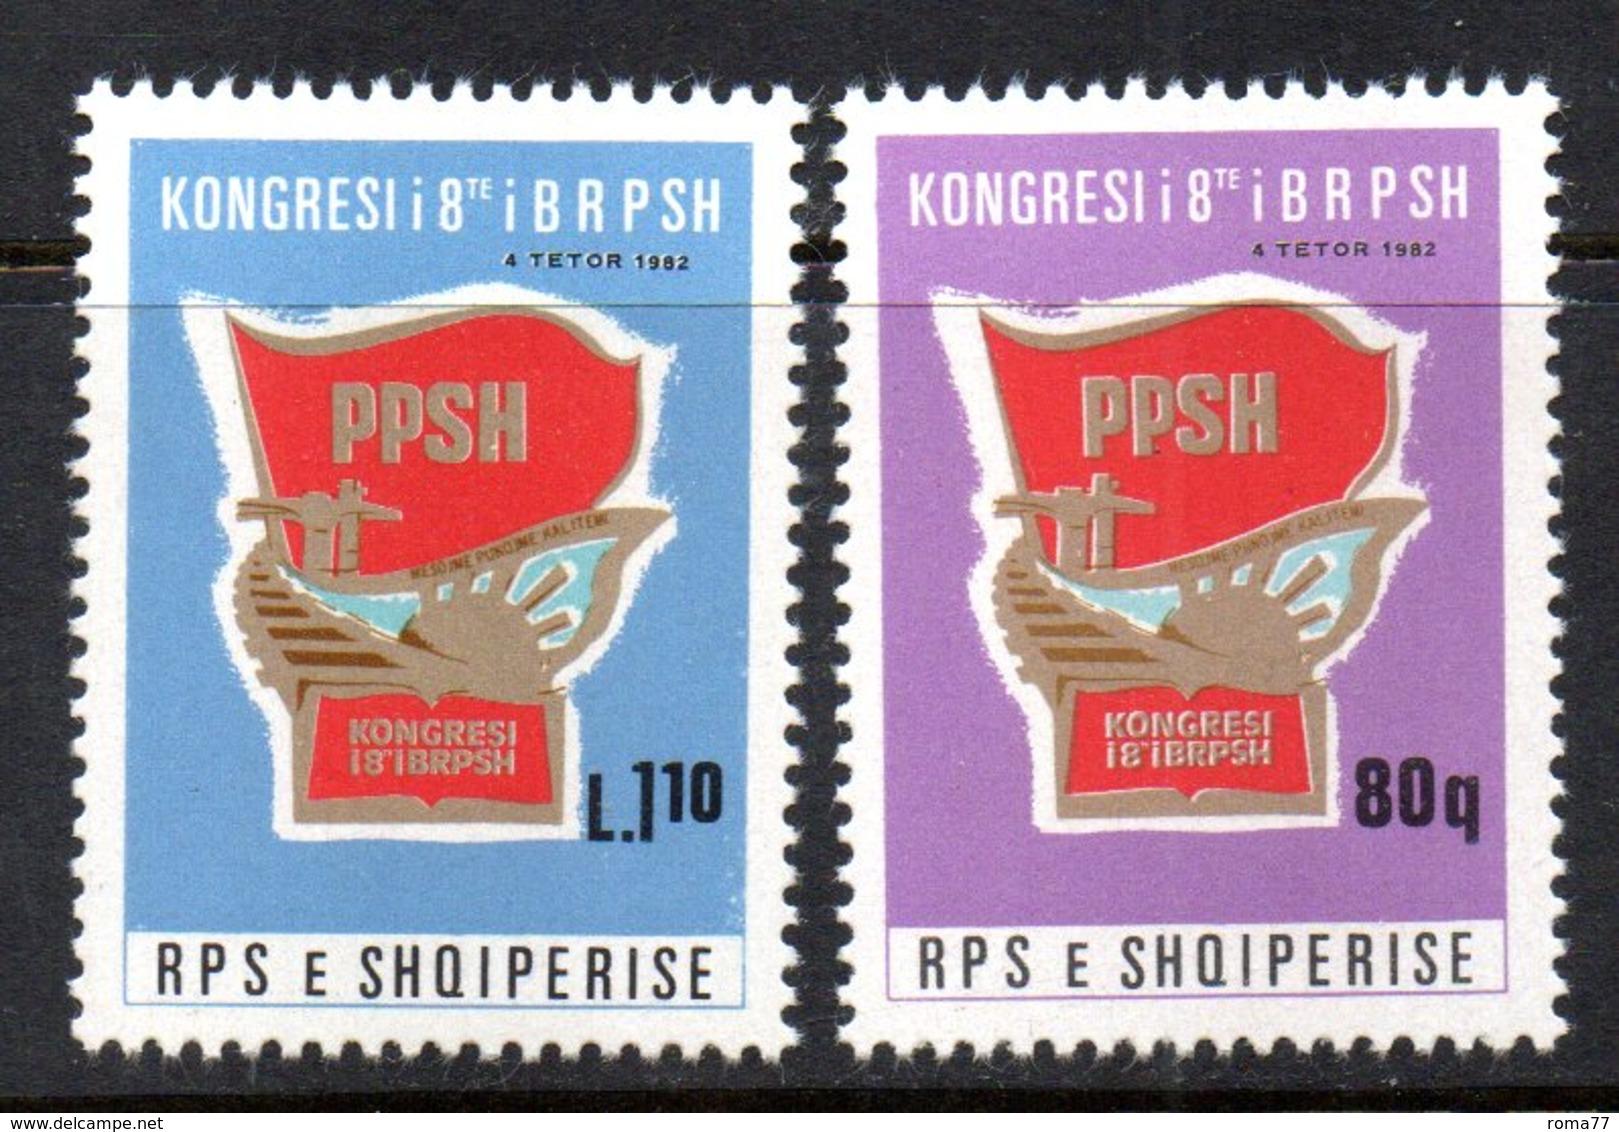 XP3984 - ALBANIA 1982 , Yvert Serie N. 1944/1945  ***  Gioventù Comunista - Albania